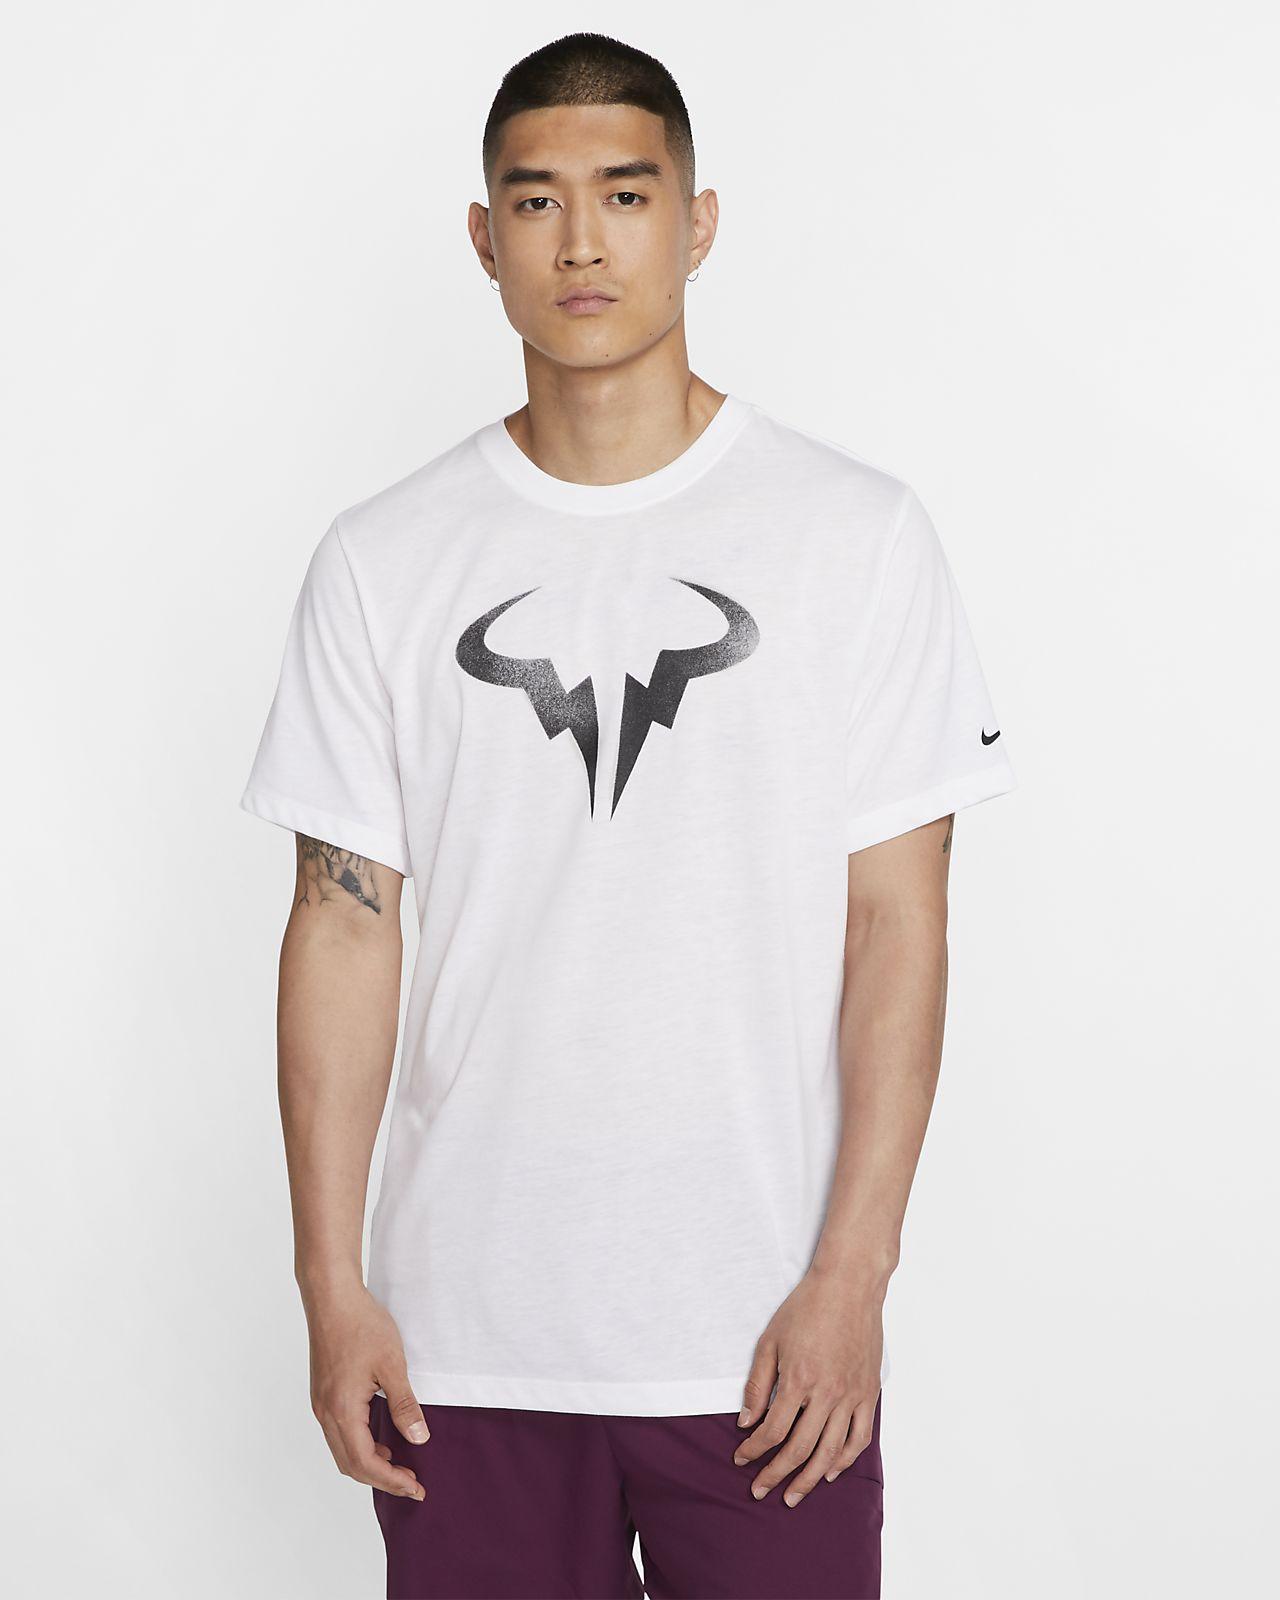 NikeCourt Dri-FIT Rafa Men's Graphic Tennis T-Shirt